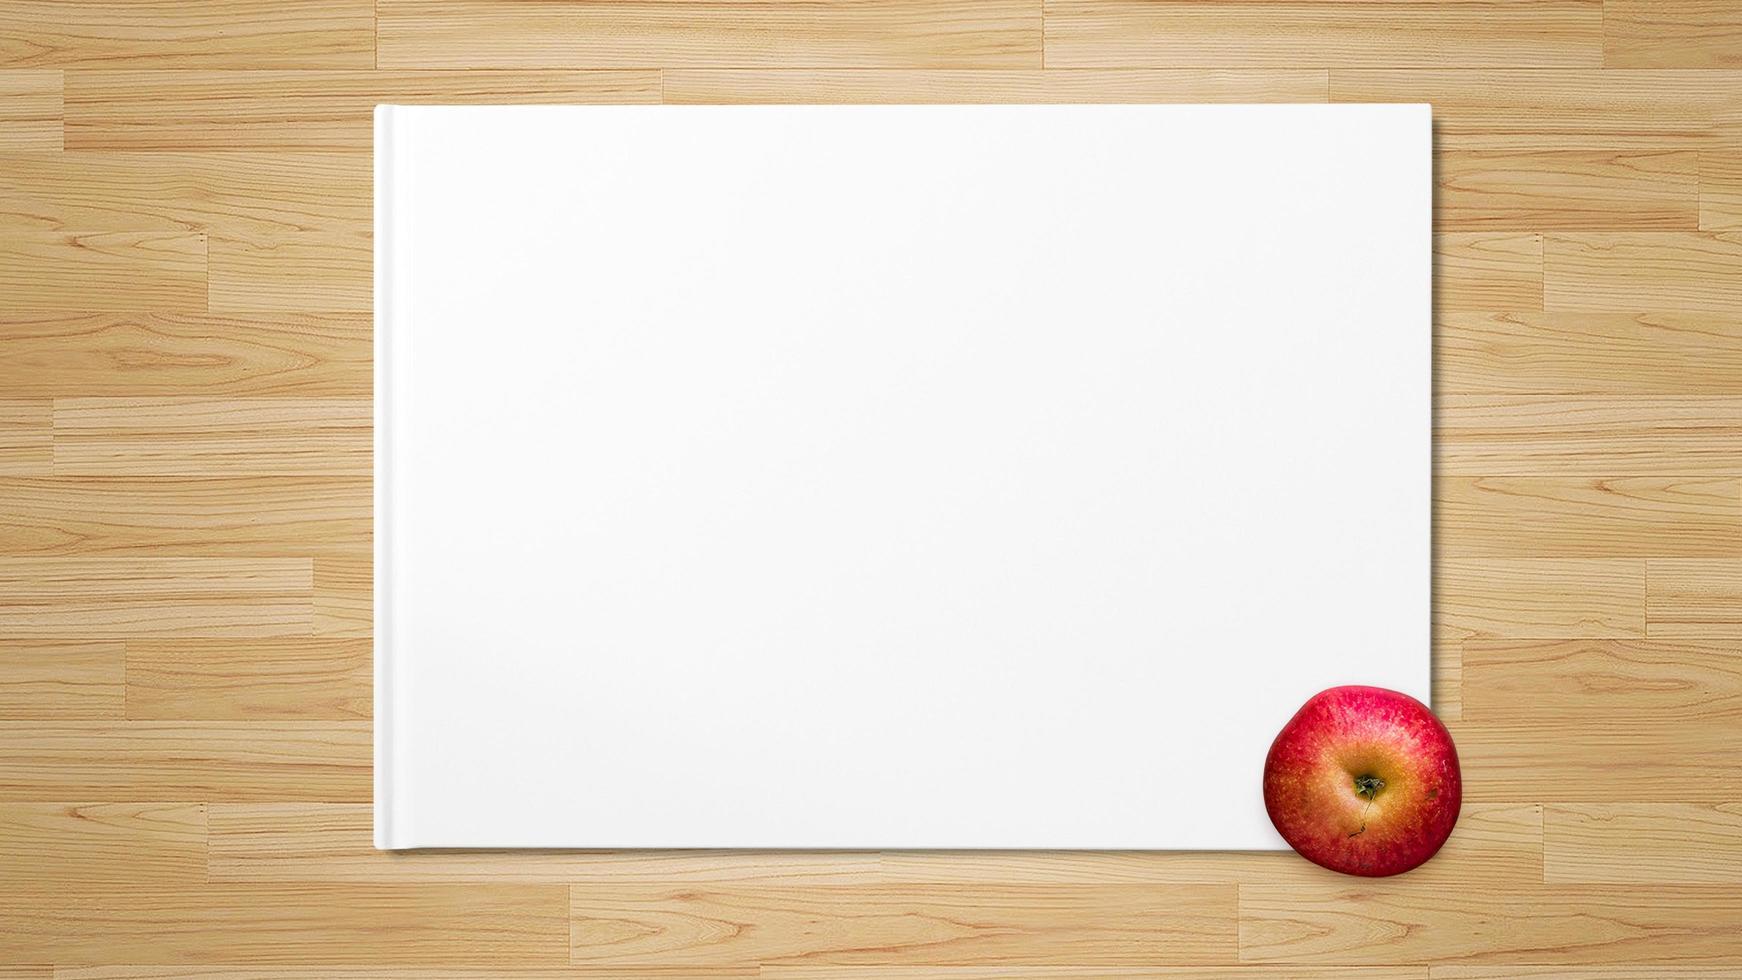 rode appel op wit papier op houten achtergrond foto